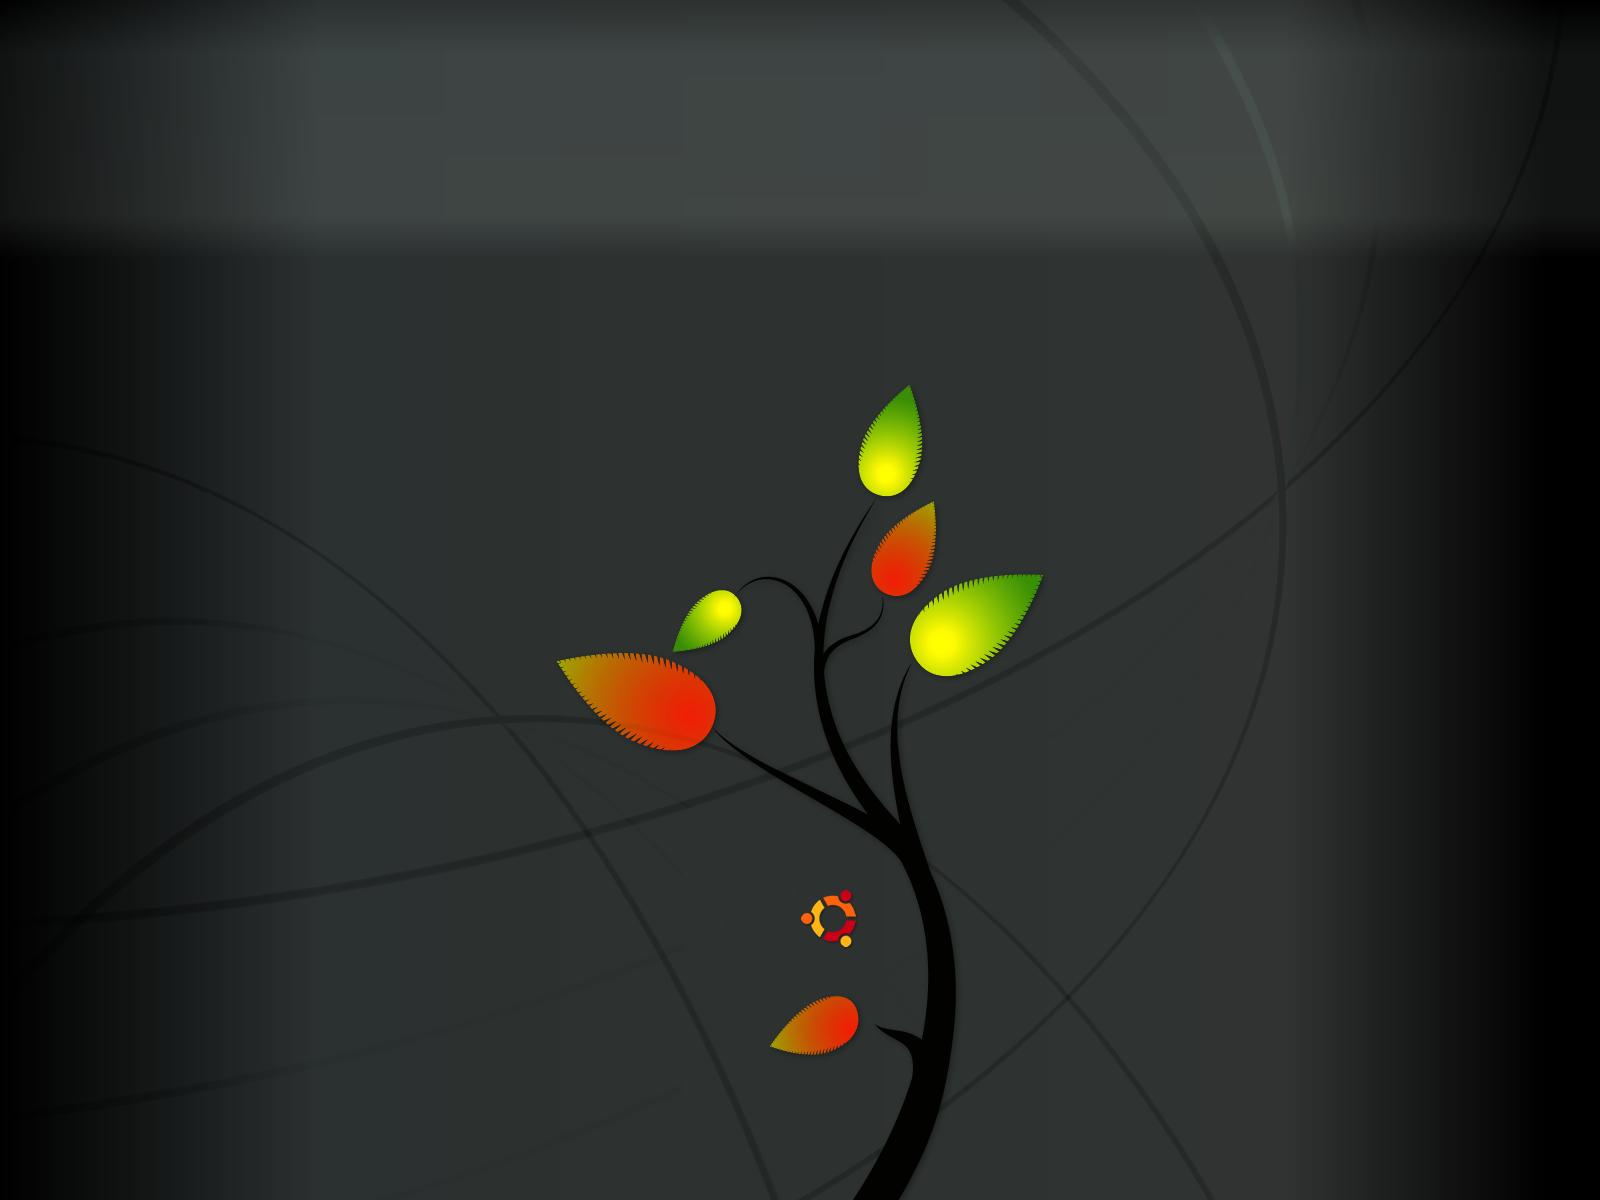 Ubuntu 3d Wallpapers Hd A1 Wallpapers